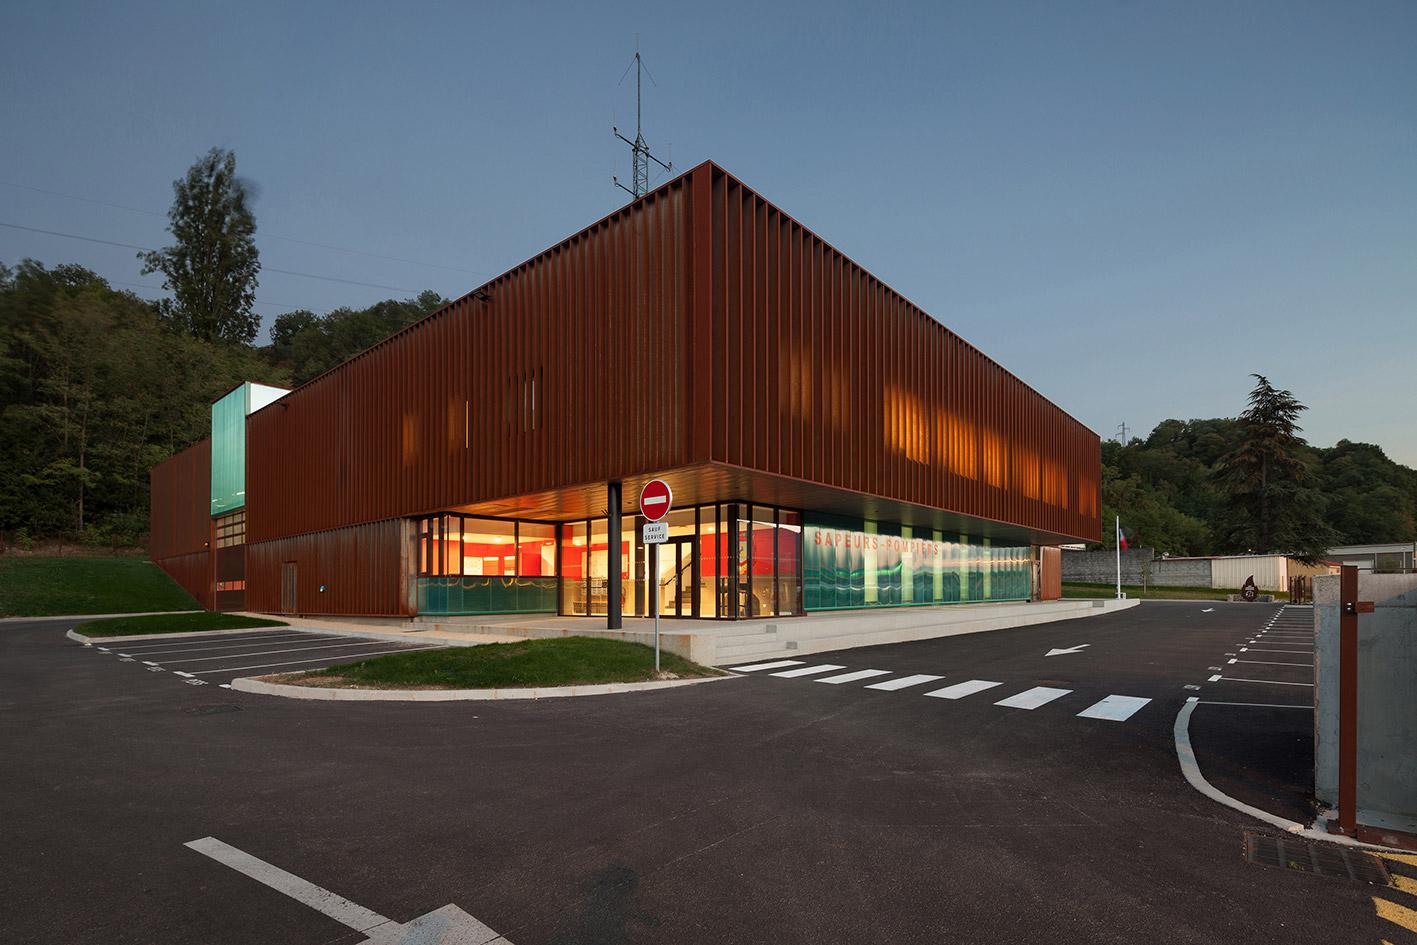 jerome-ricolleau-photographe-architecture-lyon-Composite-grenoble-sdis-caserne-pompiers-seyssel-11